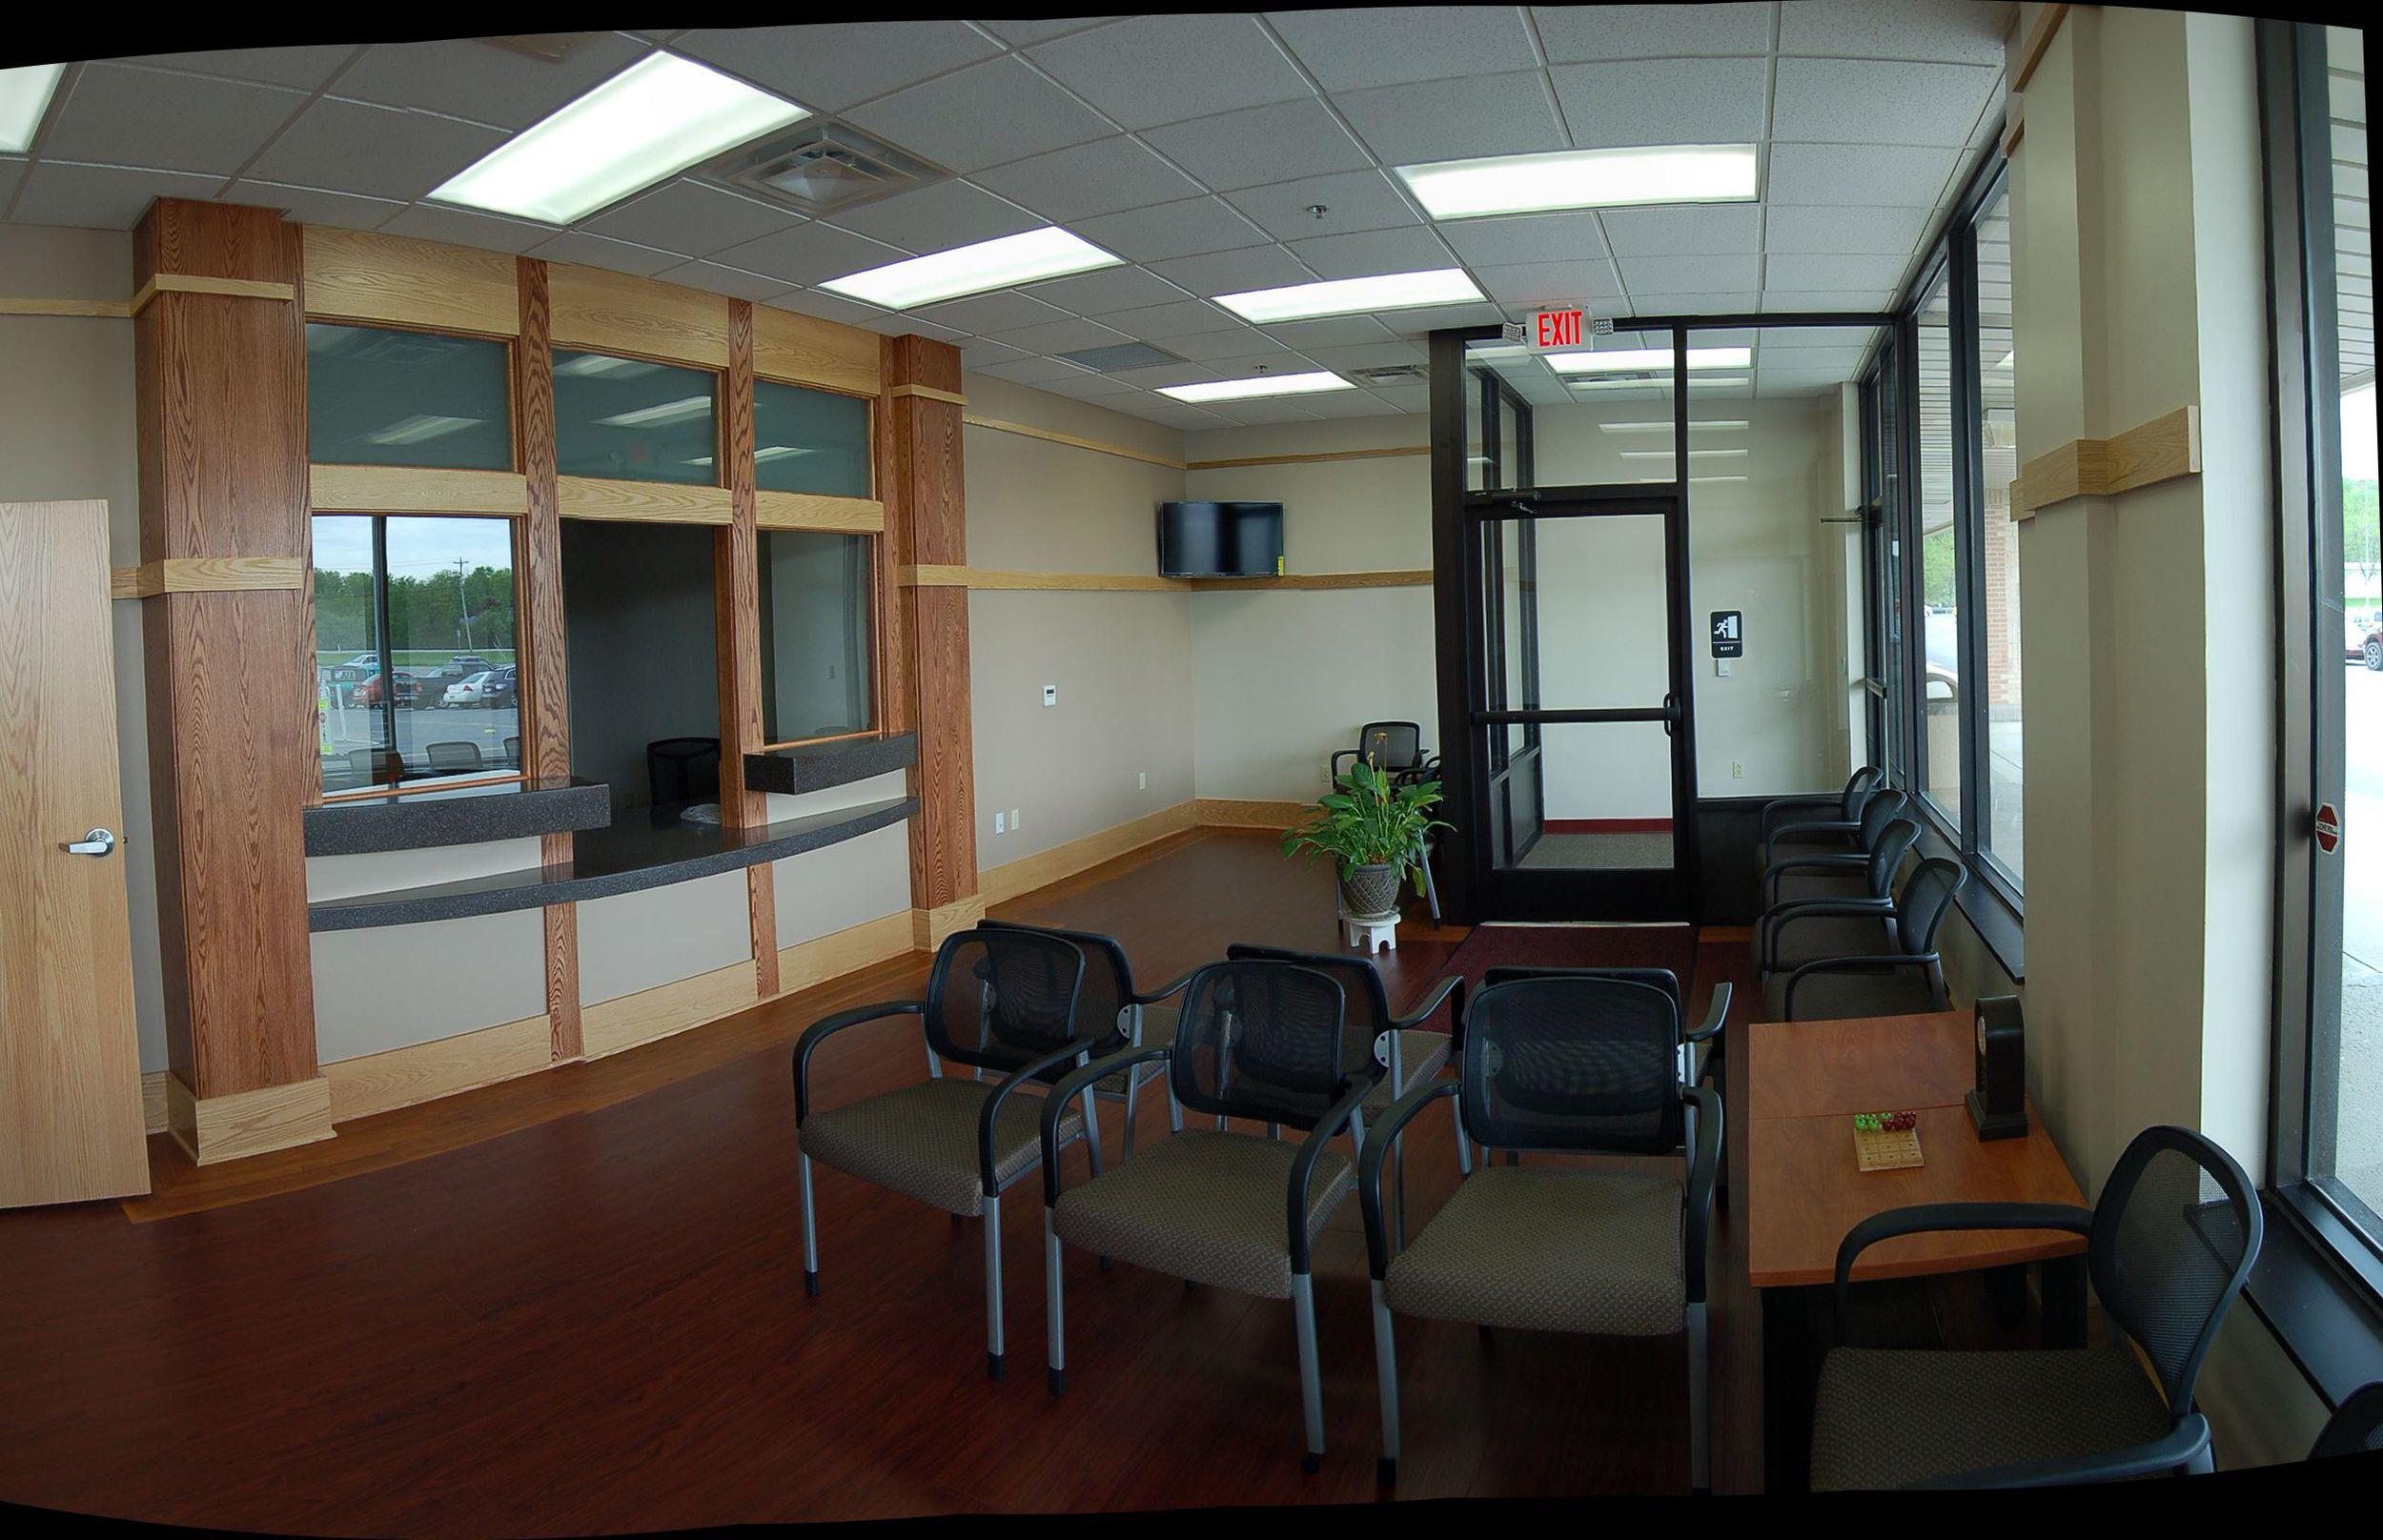 Physical Rehabilitation Facility, Ellwood City, PA (waiting area)